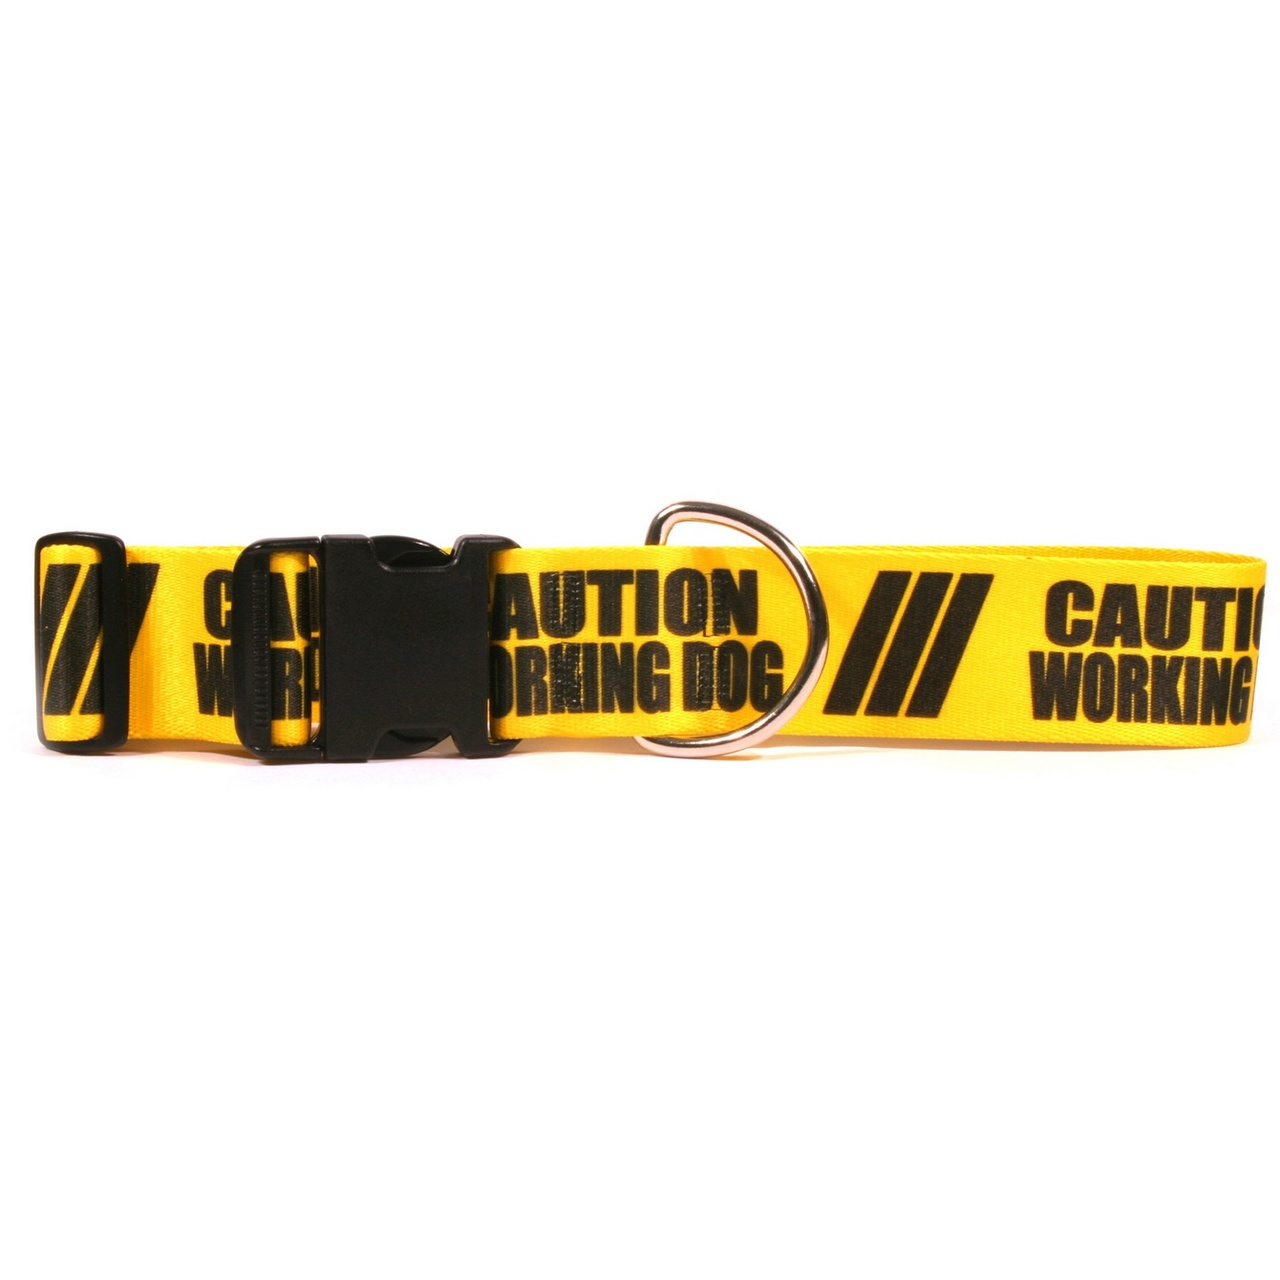 Yellow Dog 2 Inch - Caution Working Dog Dog Collar